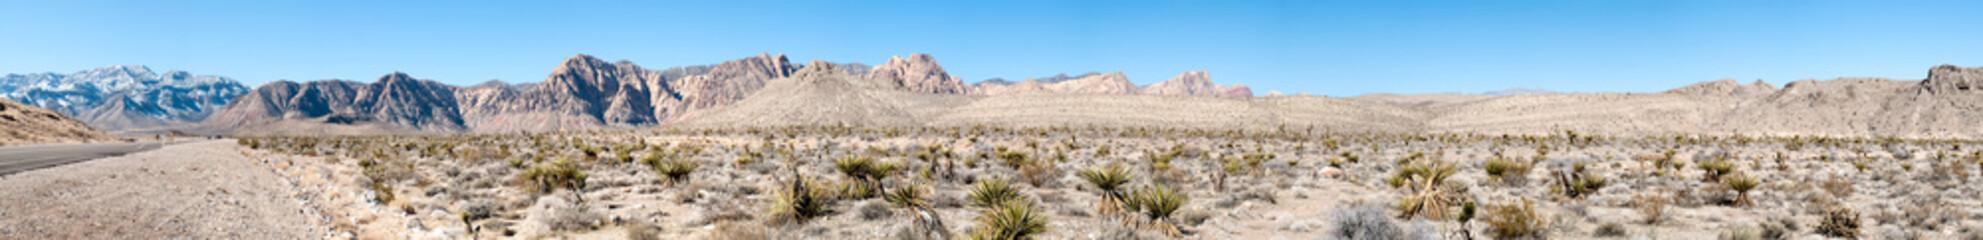 Cactus in desert, Death Valley National Park, California, USA